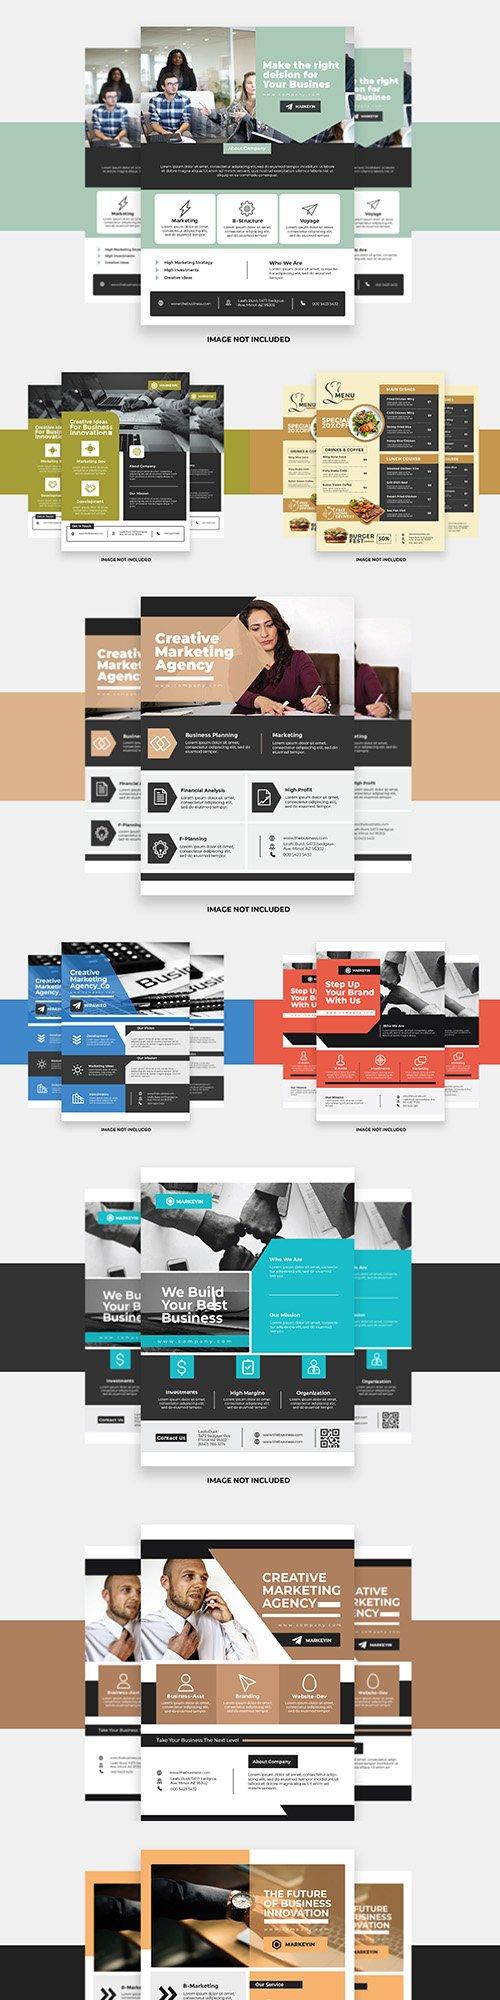 Presentation corporate flyer creative colorful design